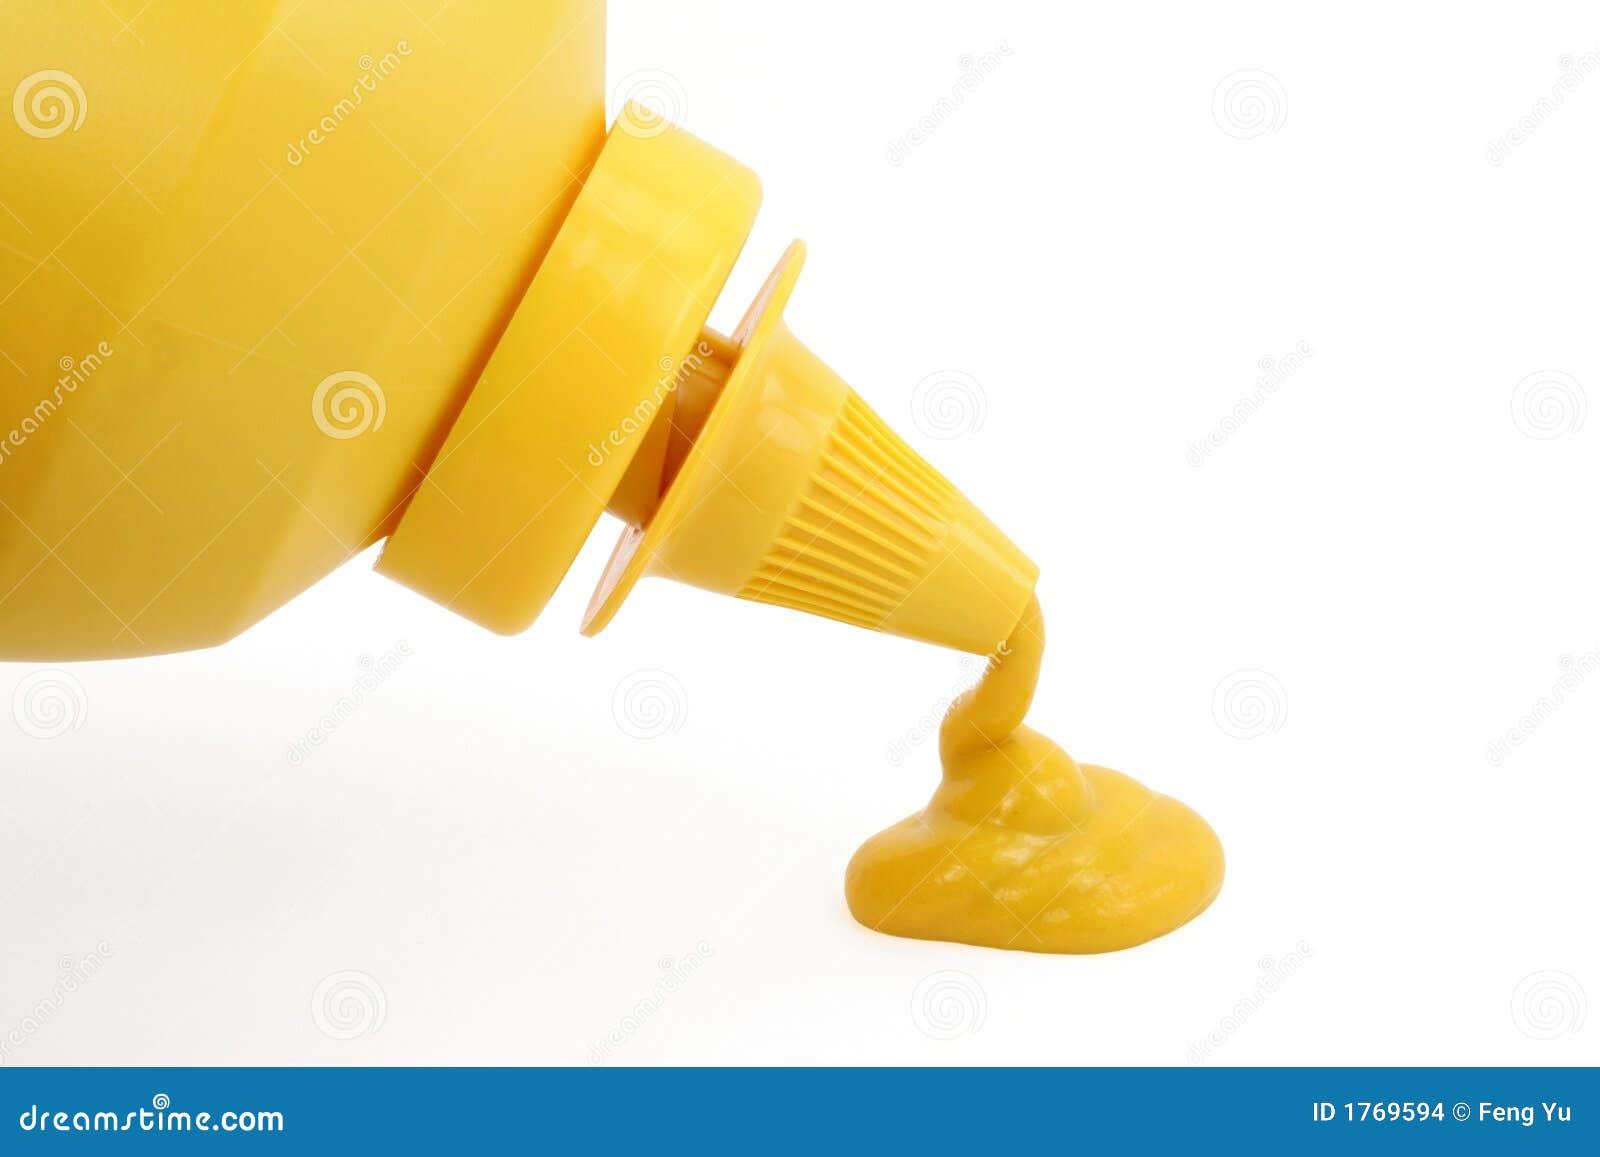 Une bouteille de moutarde jaune photo stock image 1769594 for Cuisine jaune moutarde